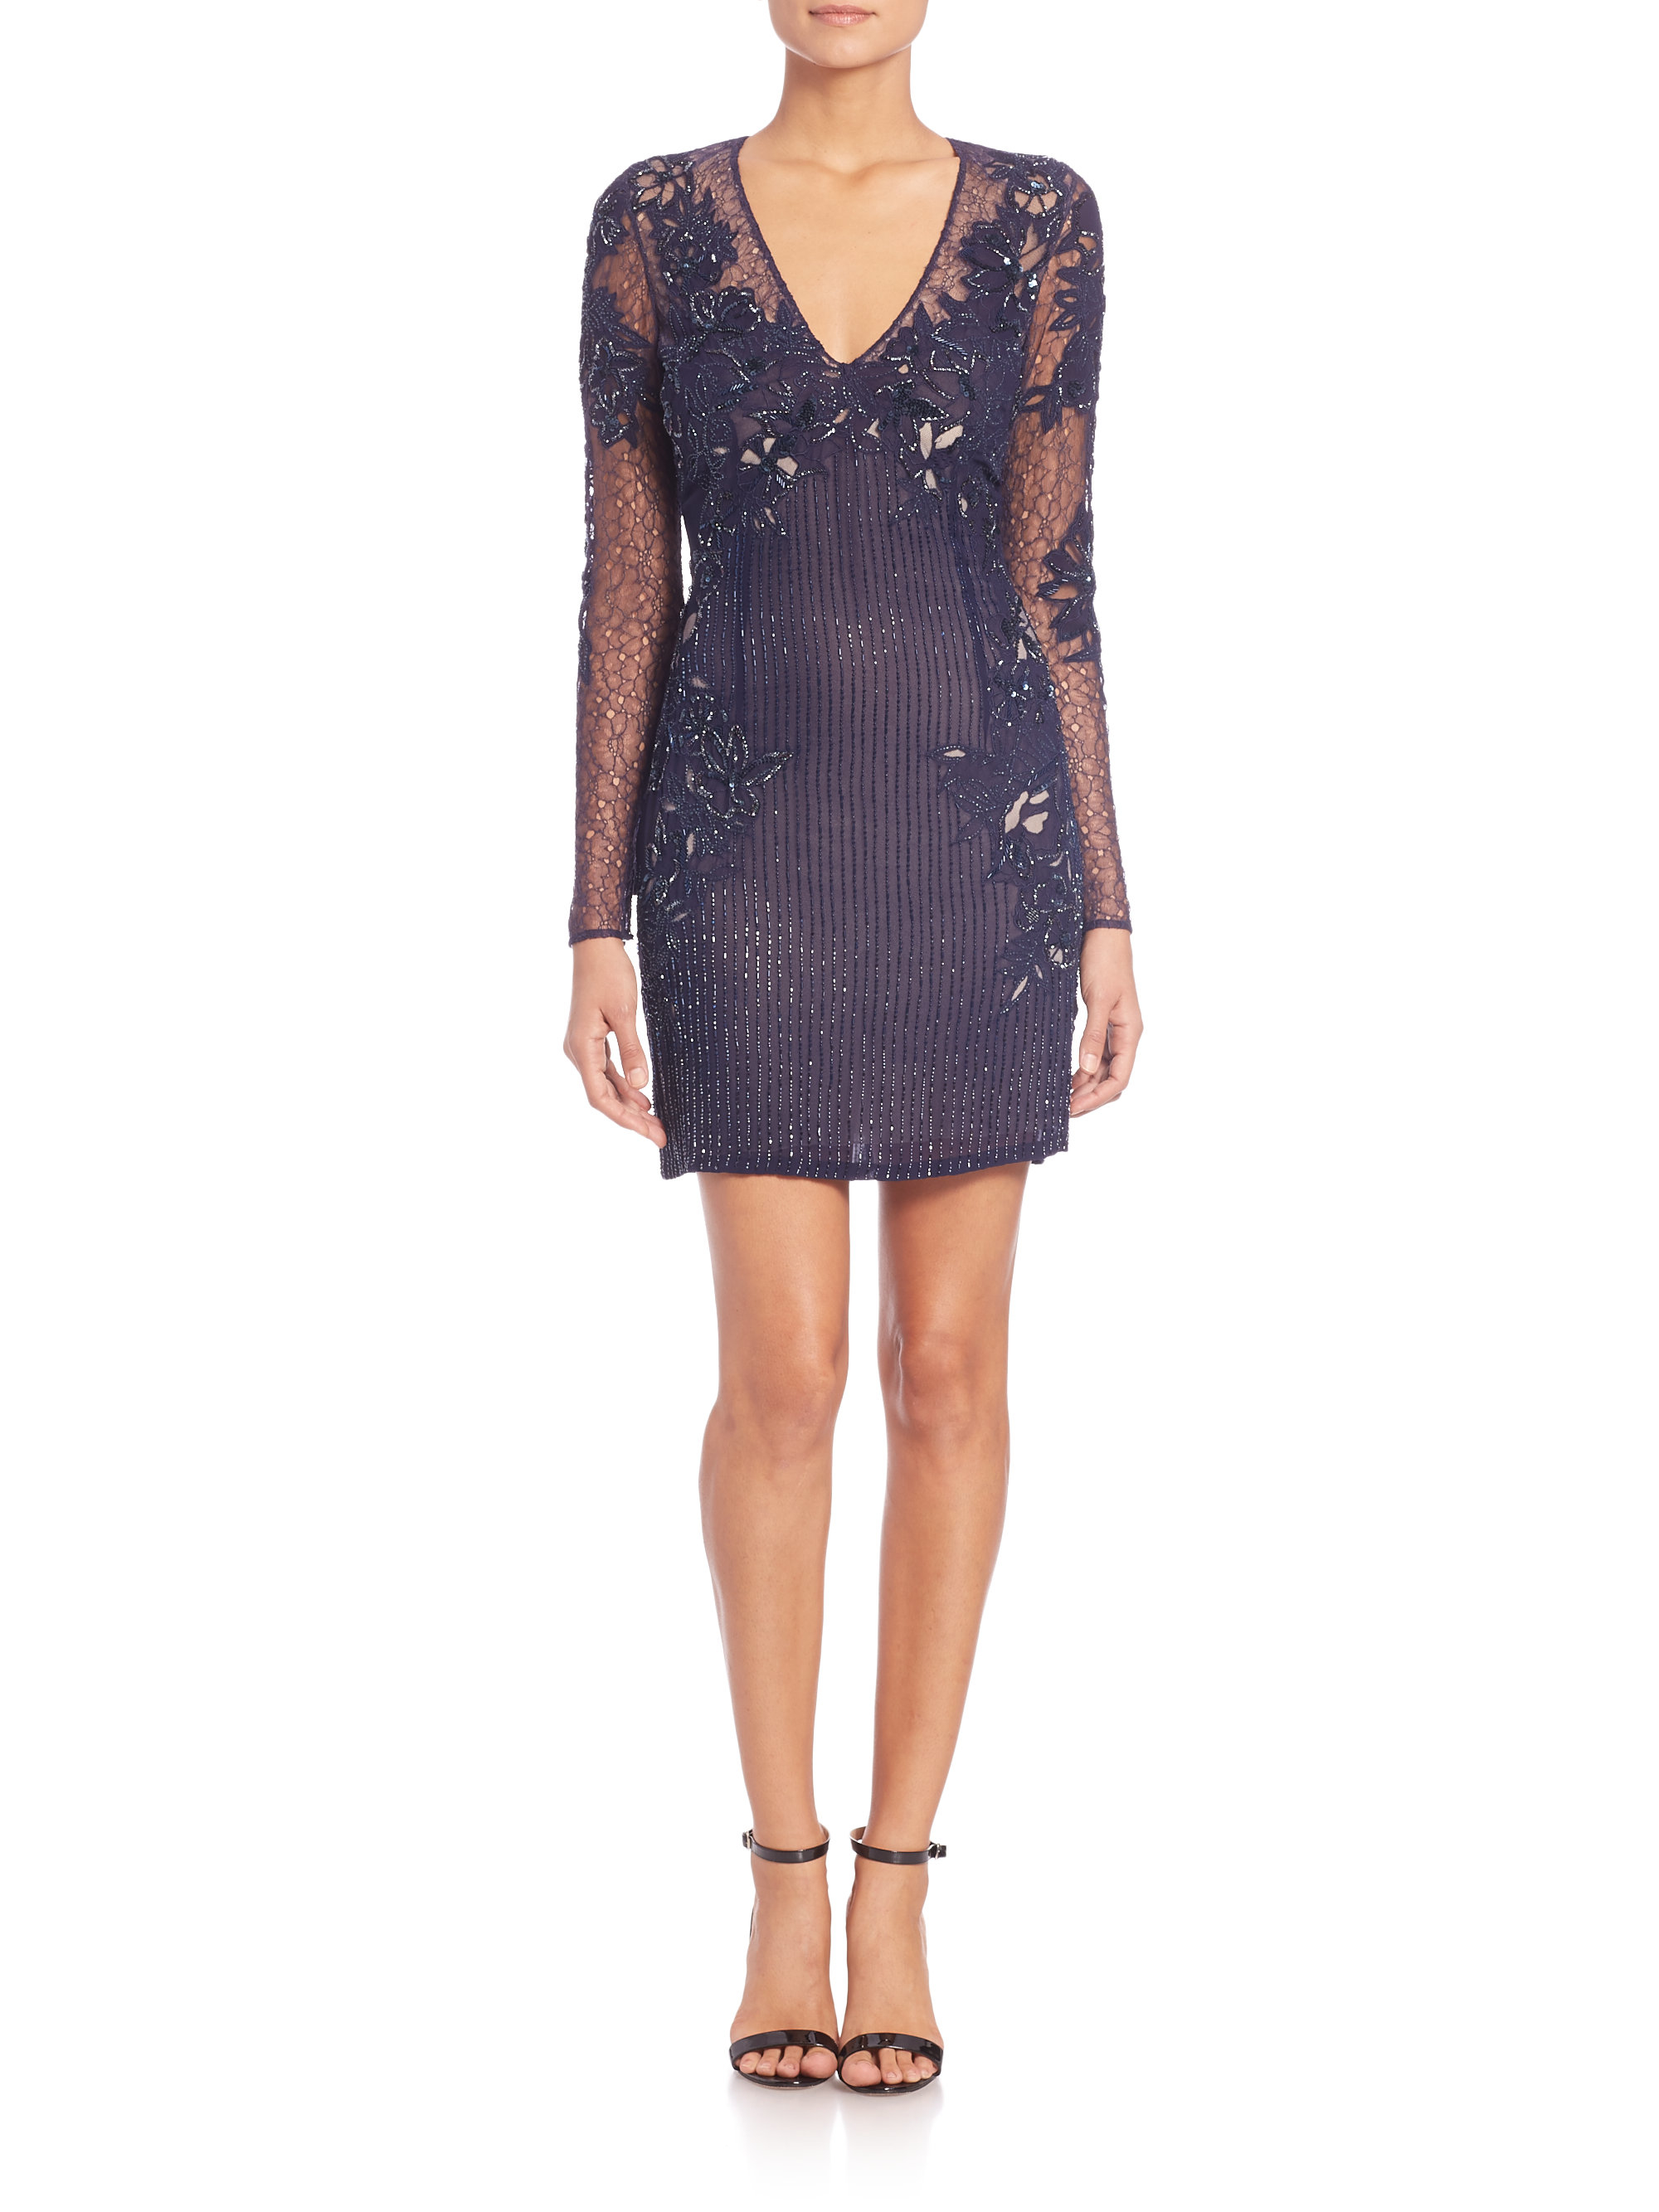 Lyst - Roberto Cavalli Beaded Silk Georgette Dress in Blue